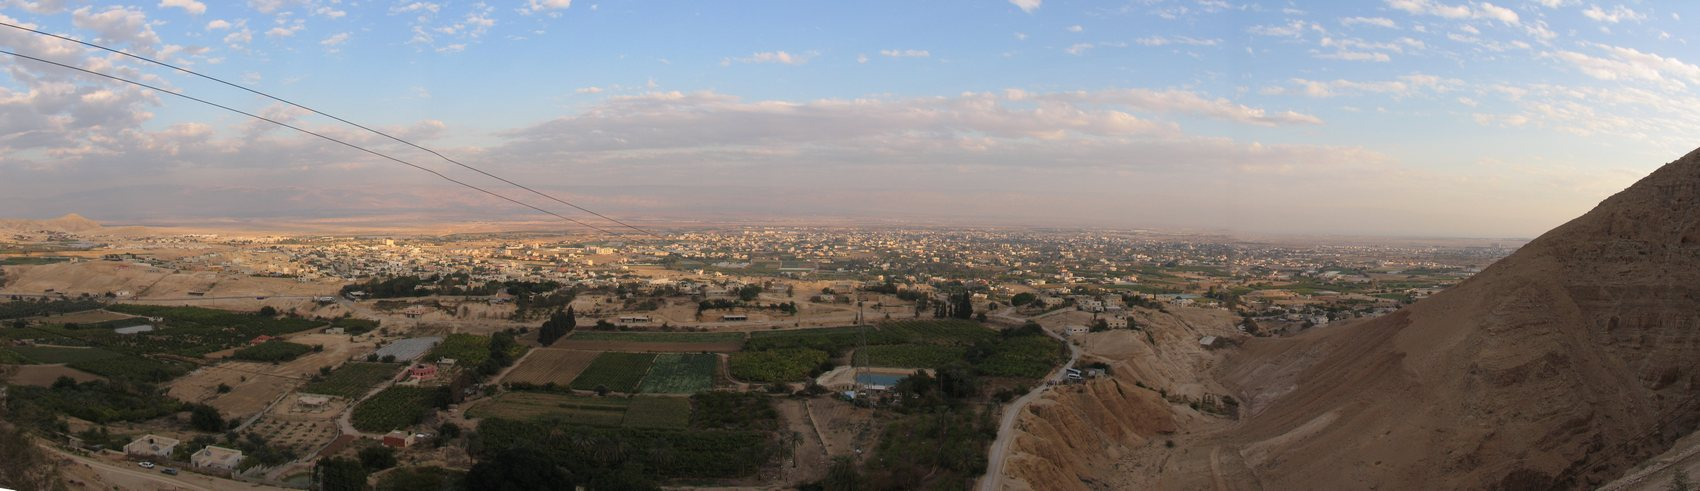 Палестина - Иерихон (Palestine - Jericho)